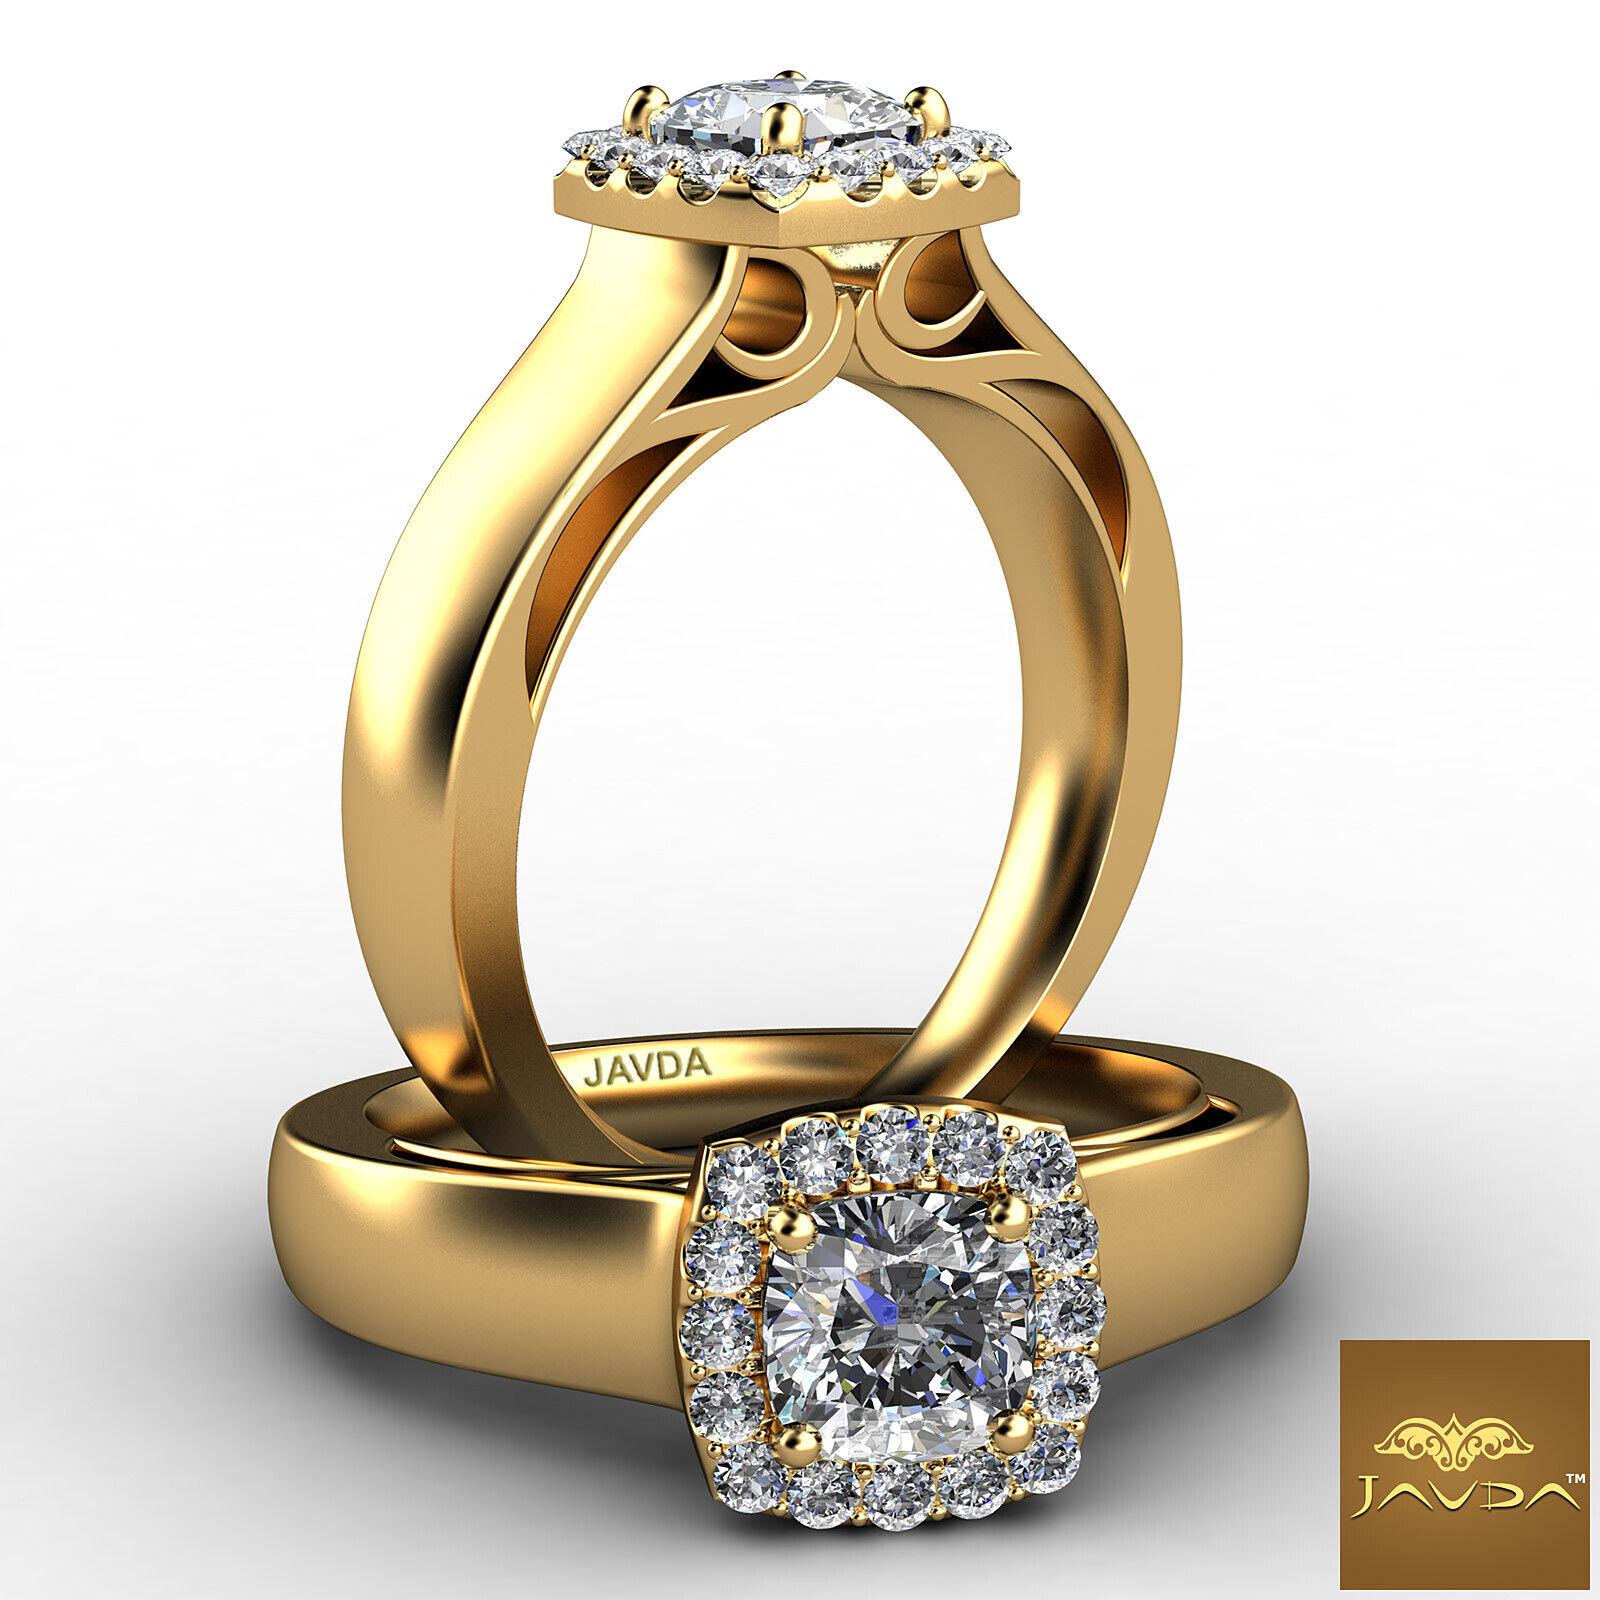 Filigree Shank U Cut Prong Cushion Diamond Engagement GIA H Color VS1 Ring 0.7Ct 4